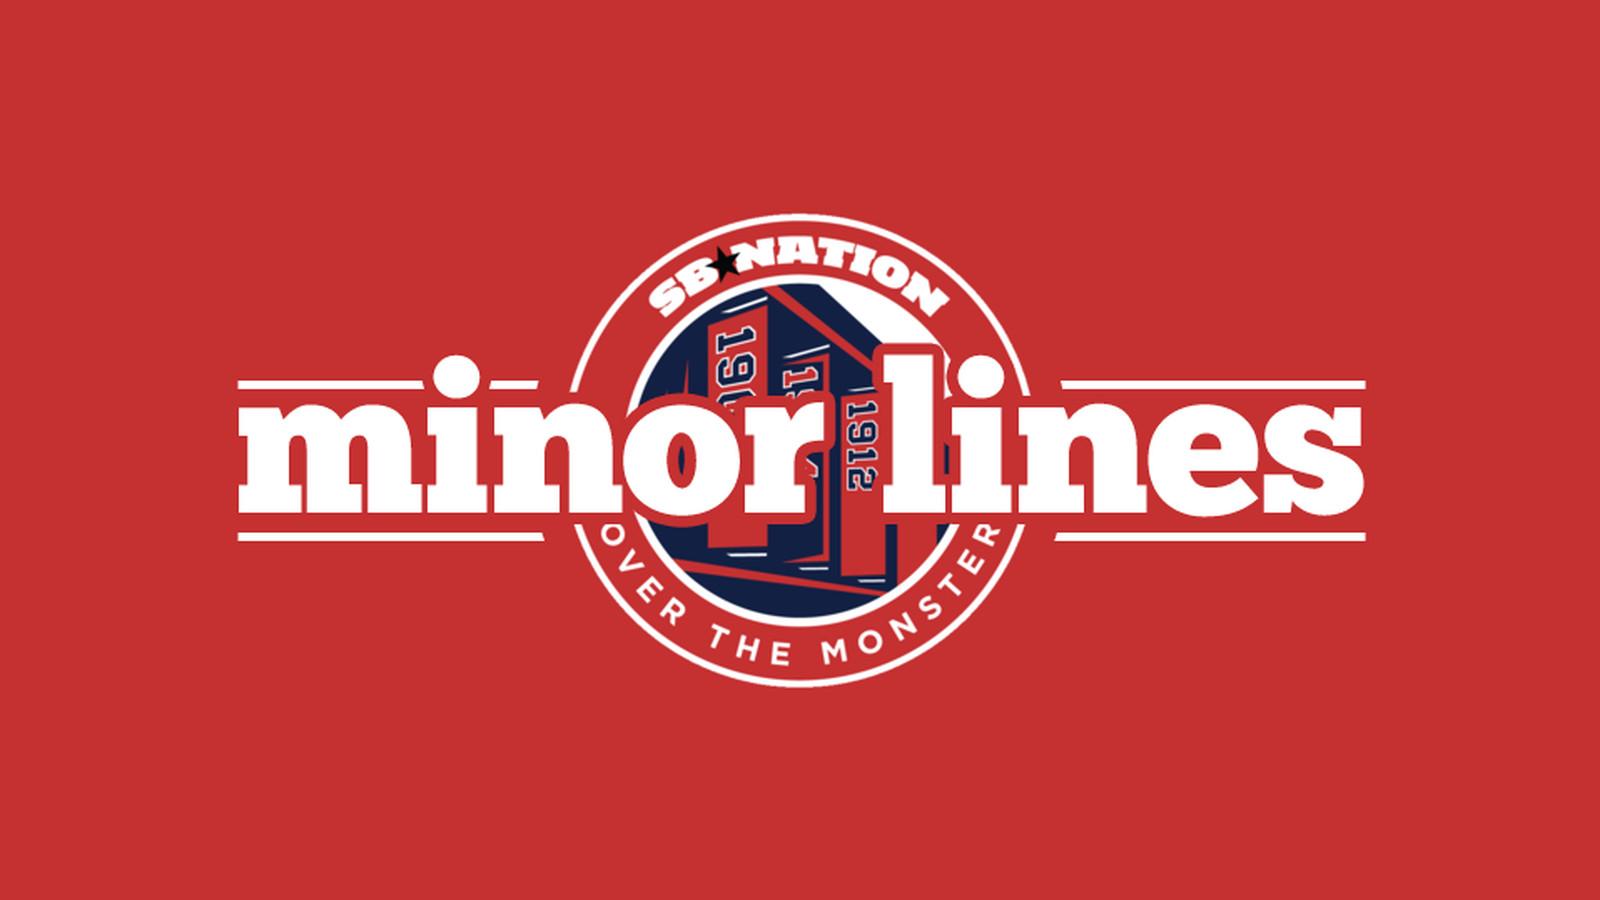 Otm-minor-lines.0